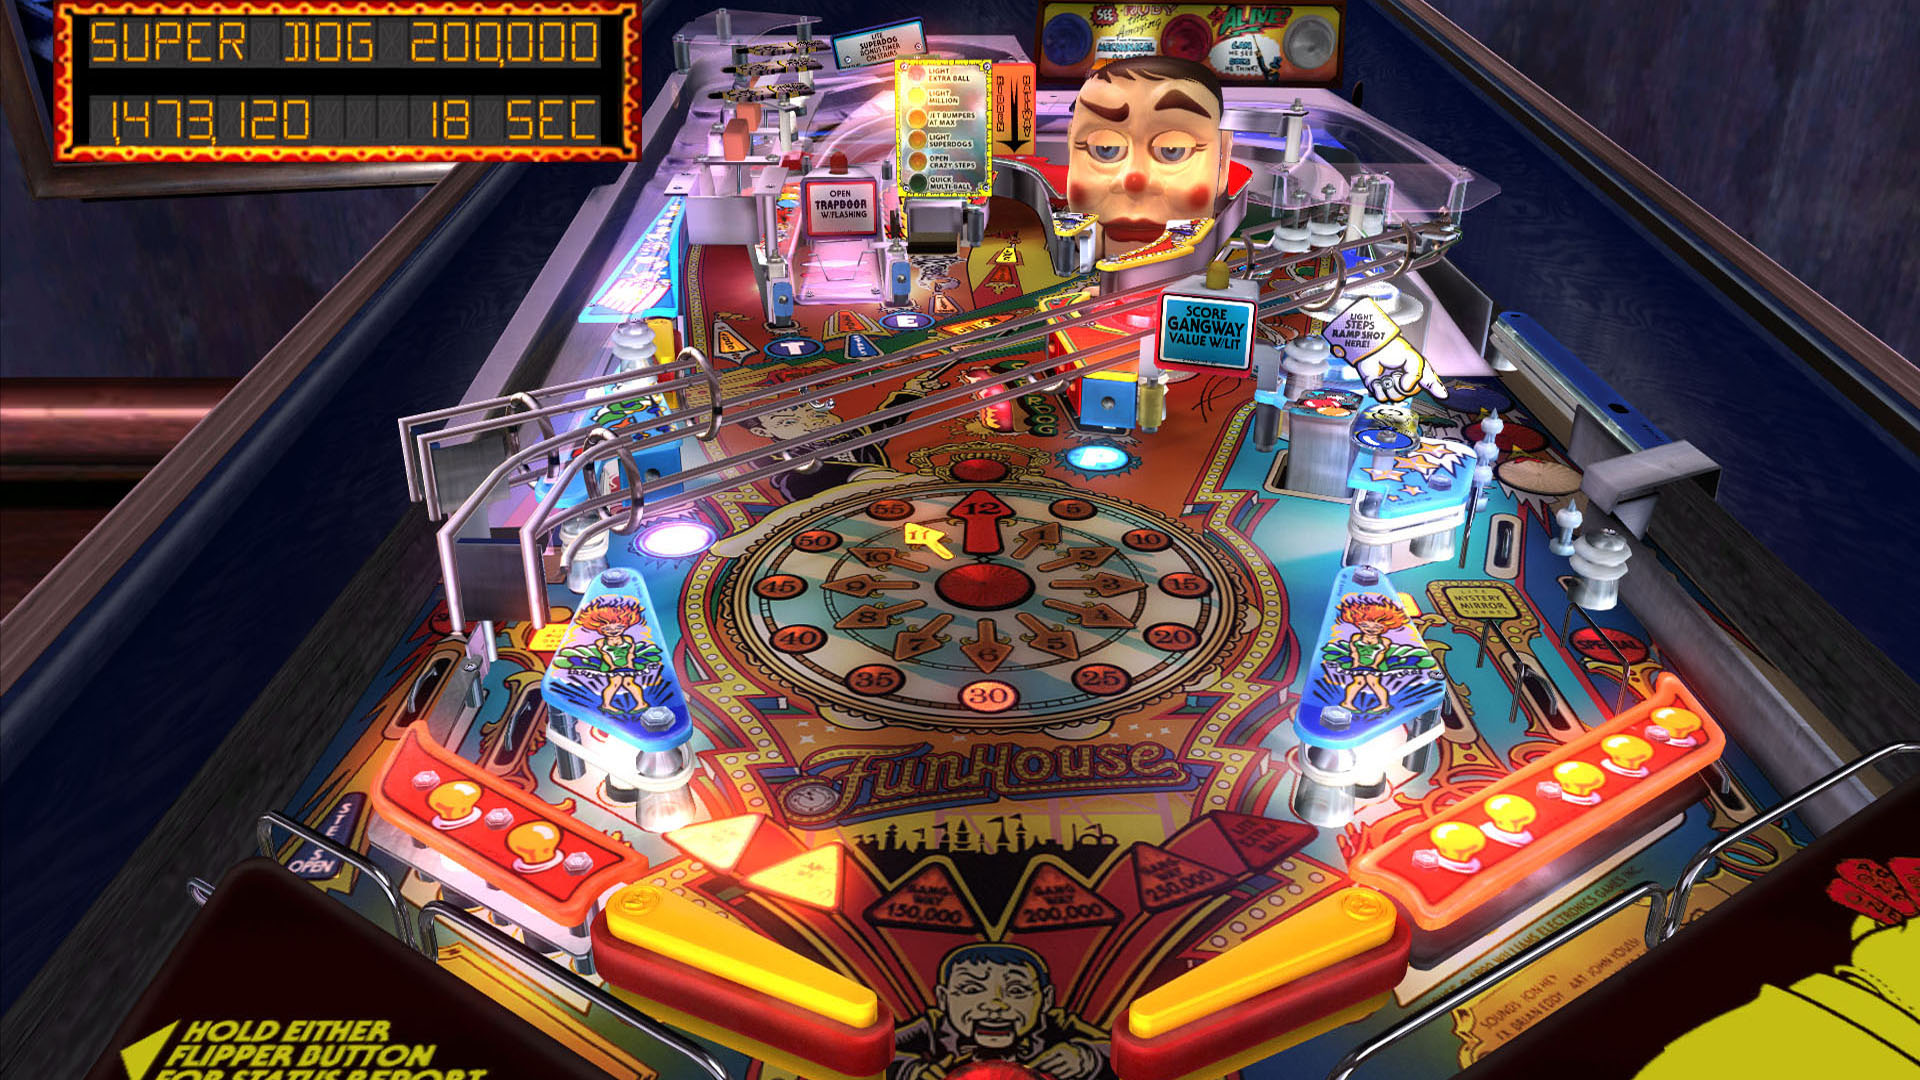 Wii U Arcade Machine : The pinball arcade dev down on wii u s power nintendo